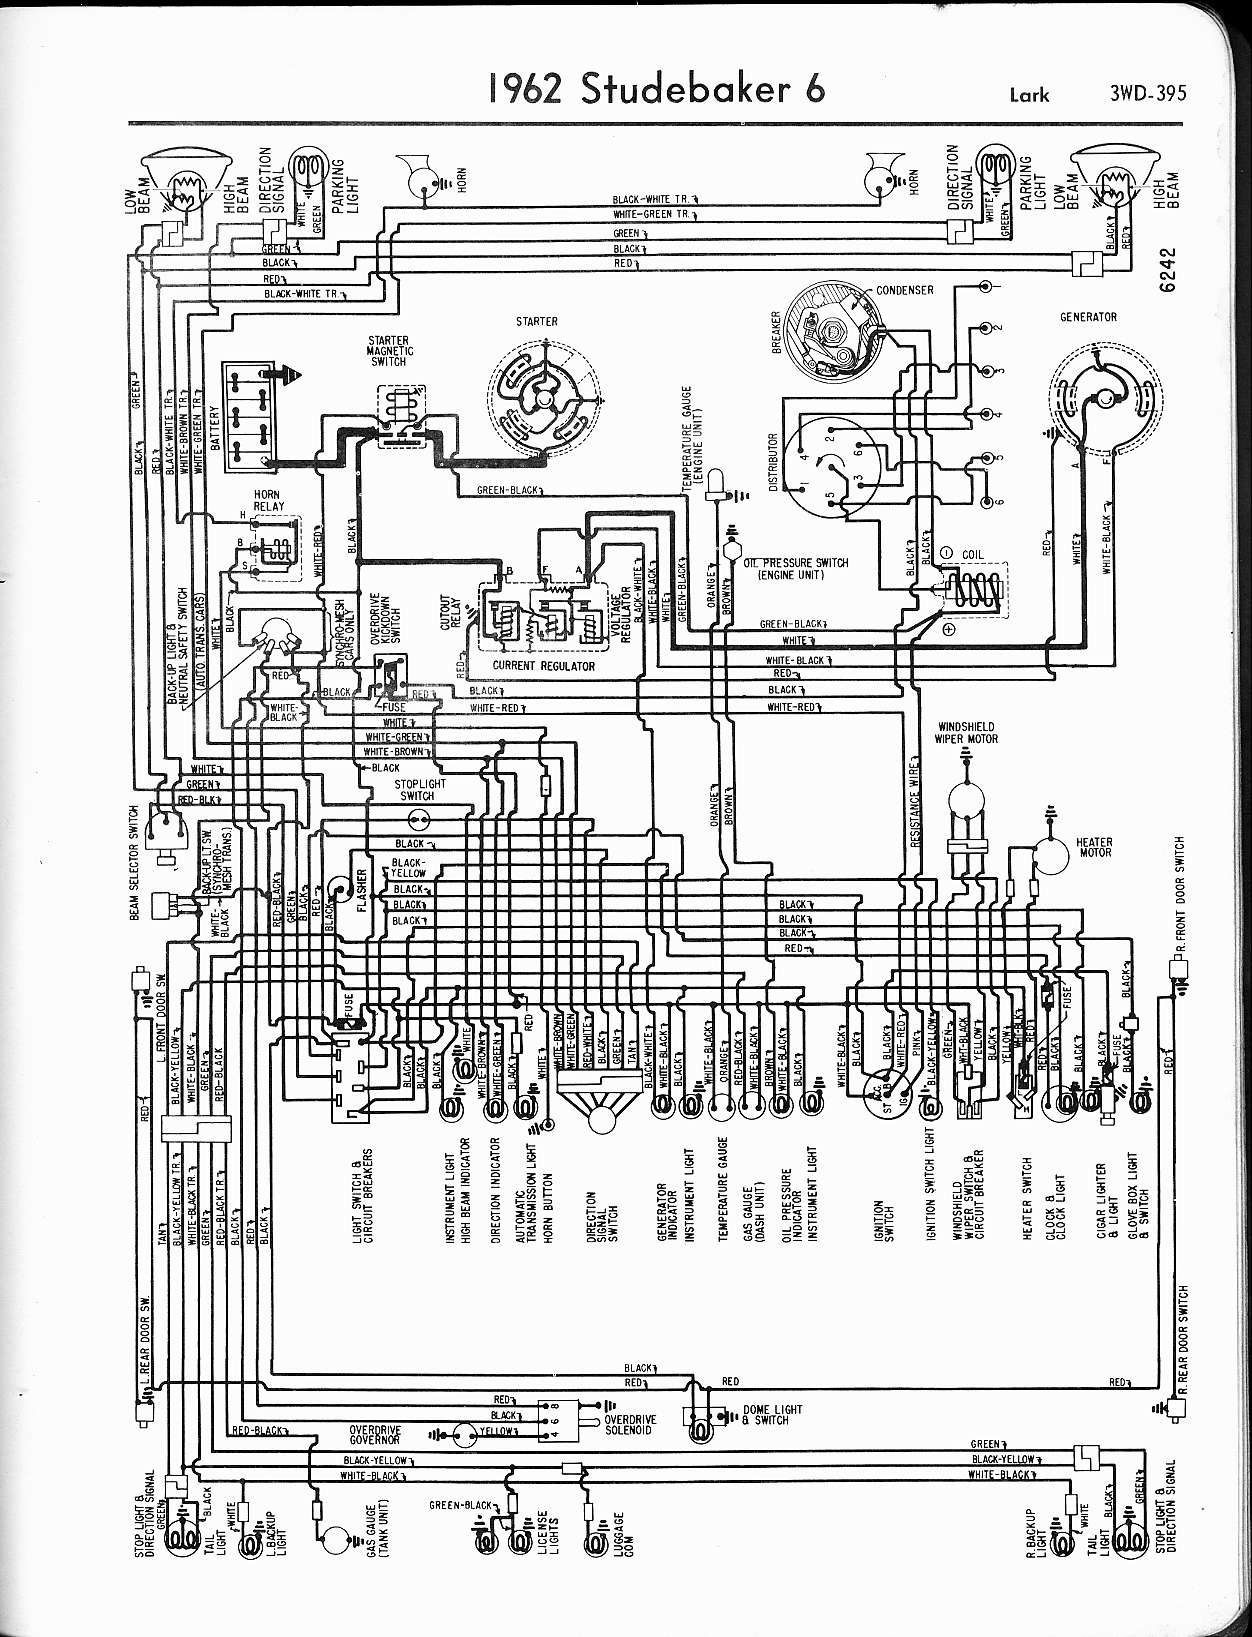 Studebaker wiring diagrams - The Old Car Manual ProjectThe Old Car Manual Project